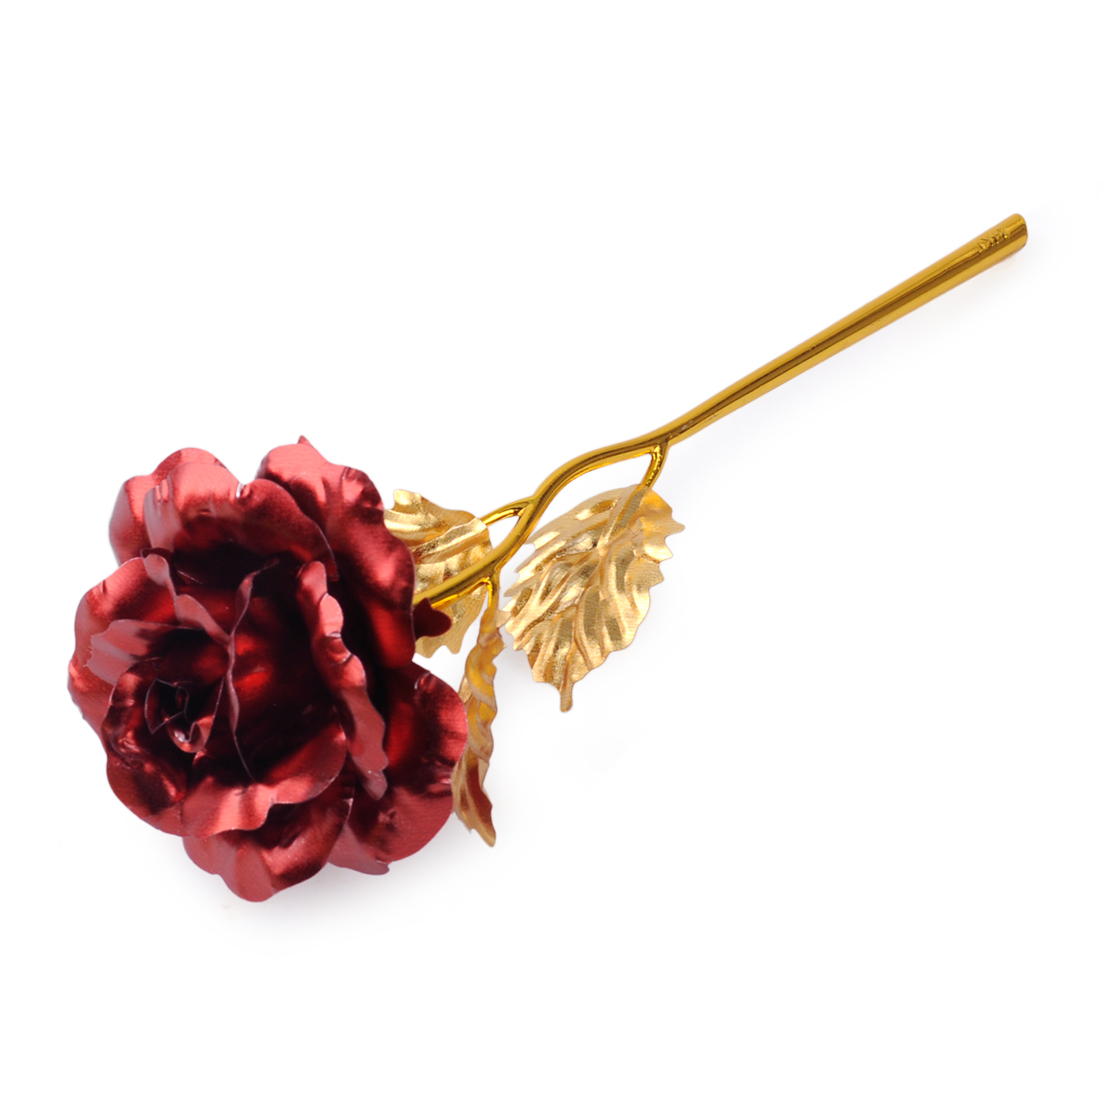 24k Plated Gold Rose Dipped Foil Flower Birthday Christmas Wedding